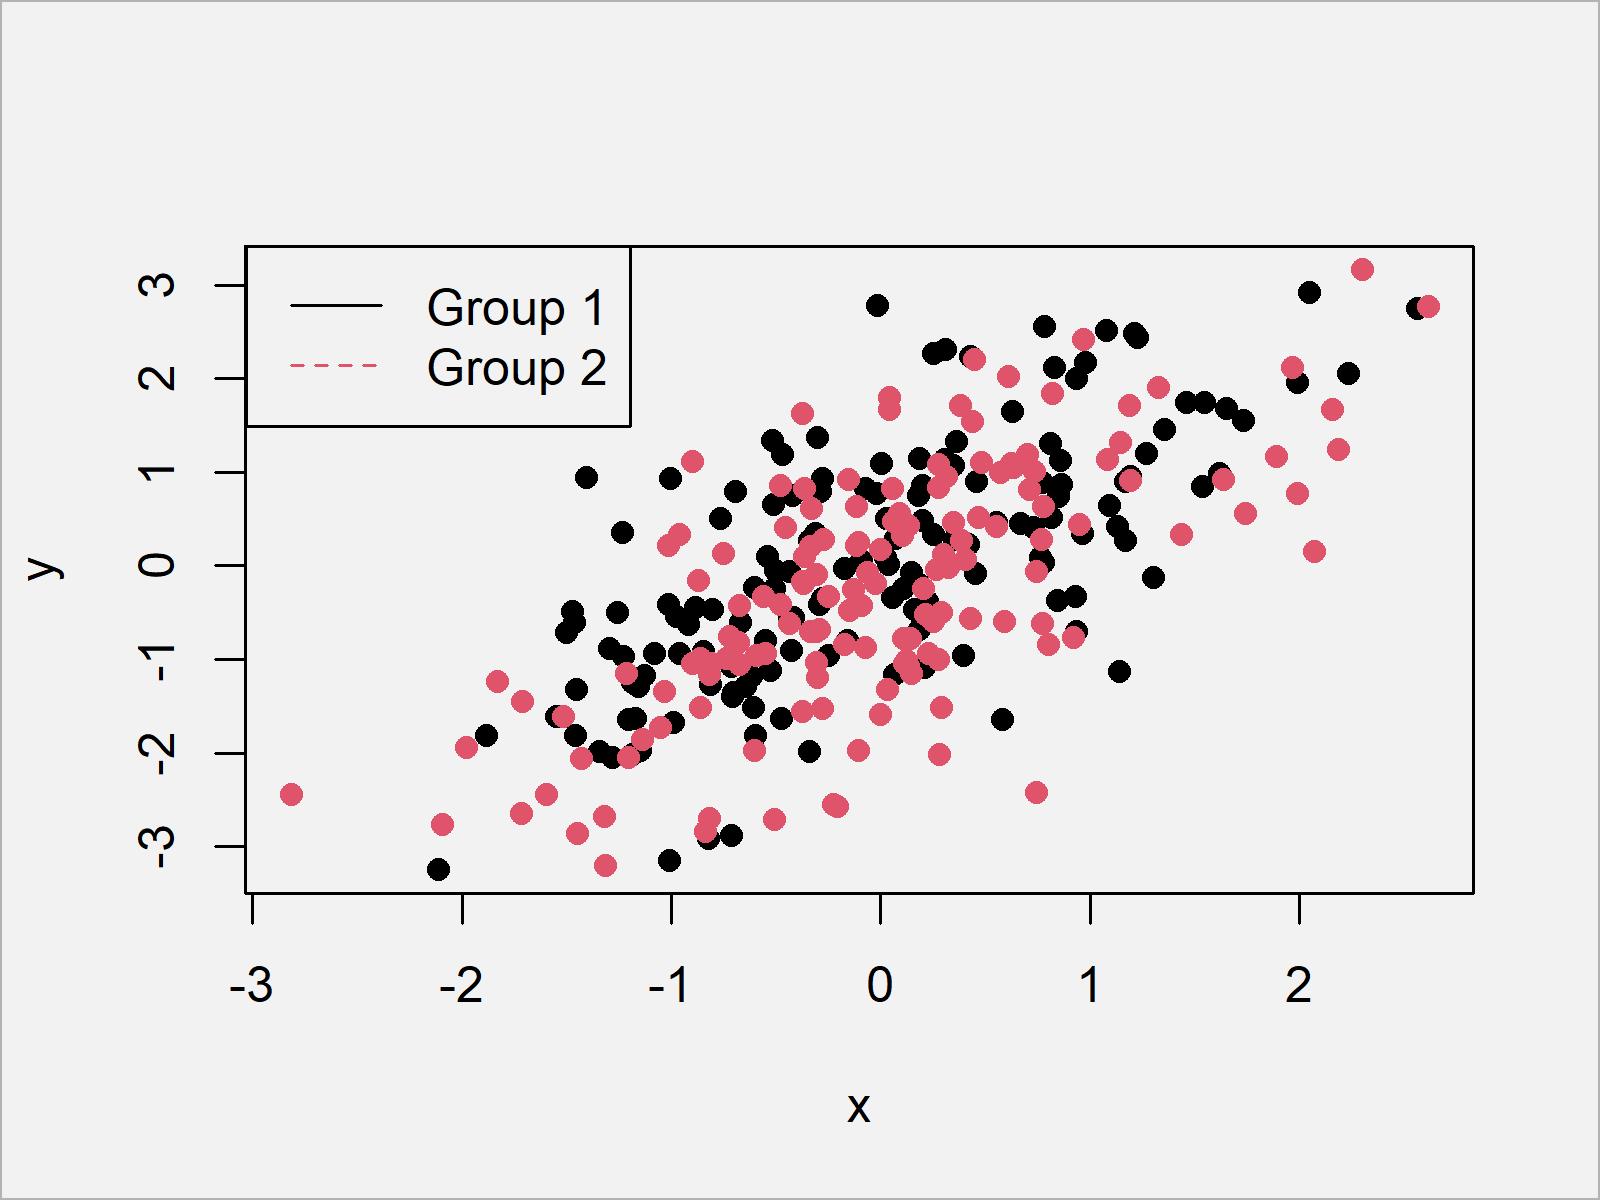 r graph figure 9 add legend base